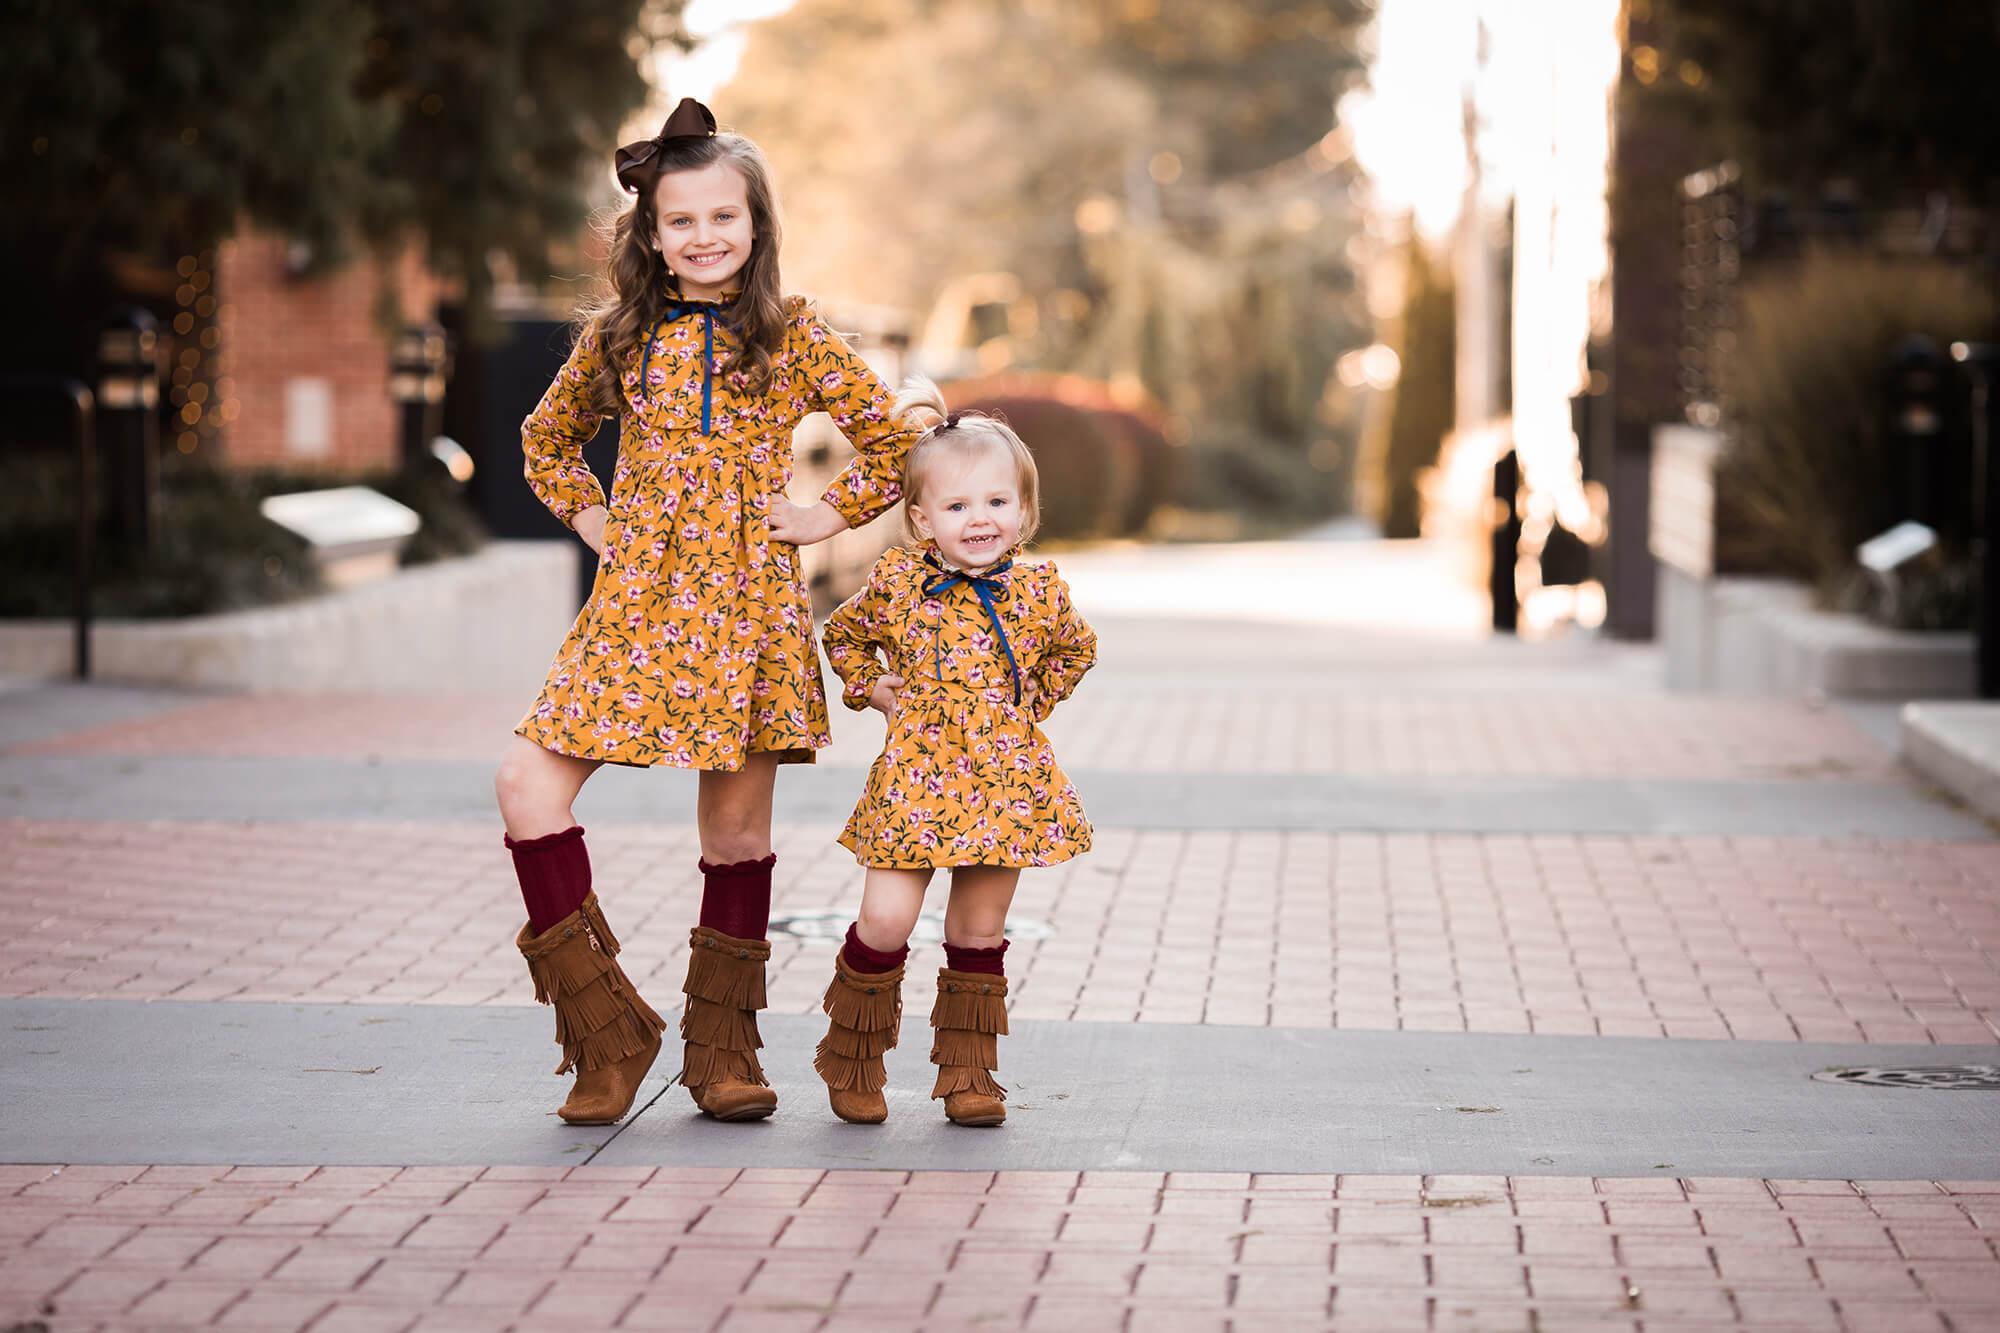 Sweet Snaps Photography - Michigan City Indiana Family Photographer